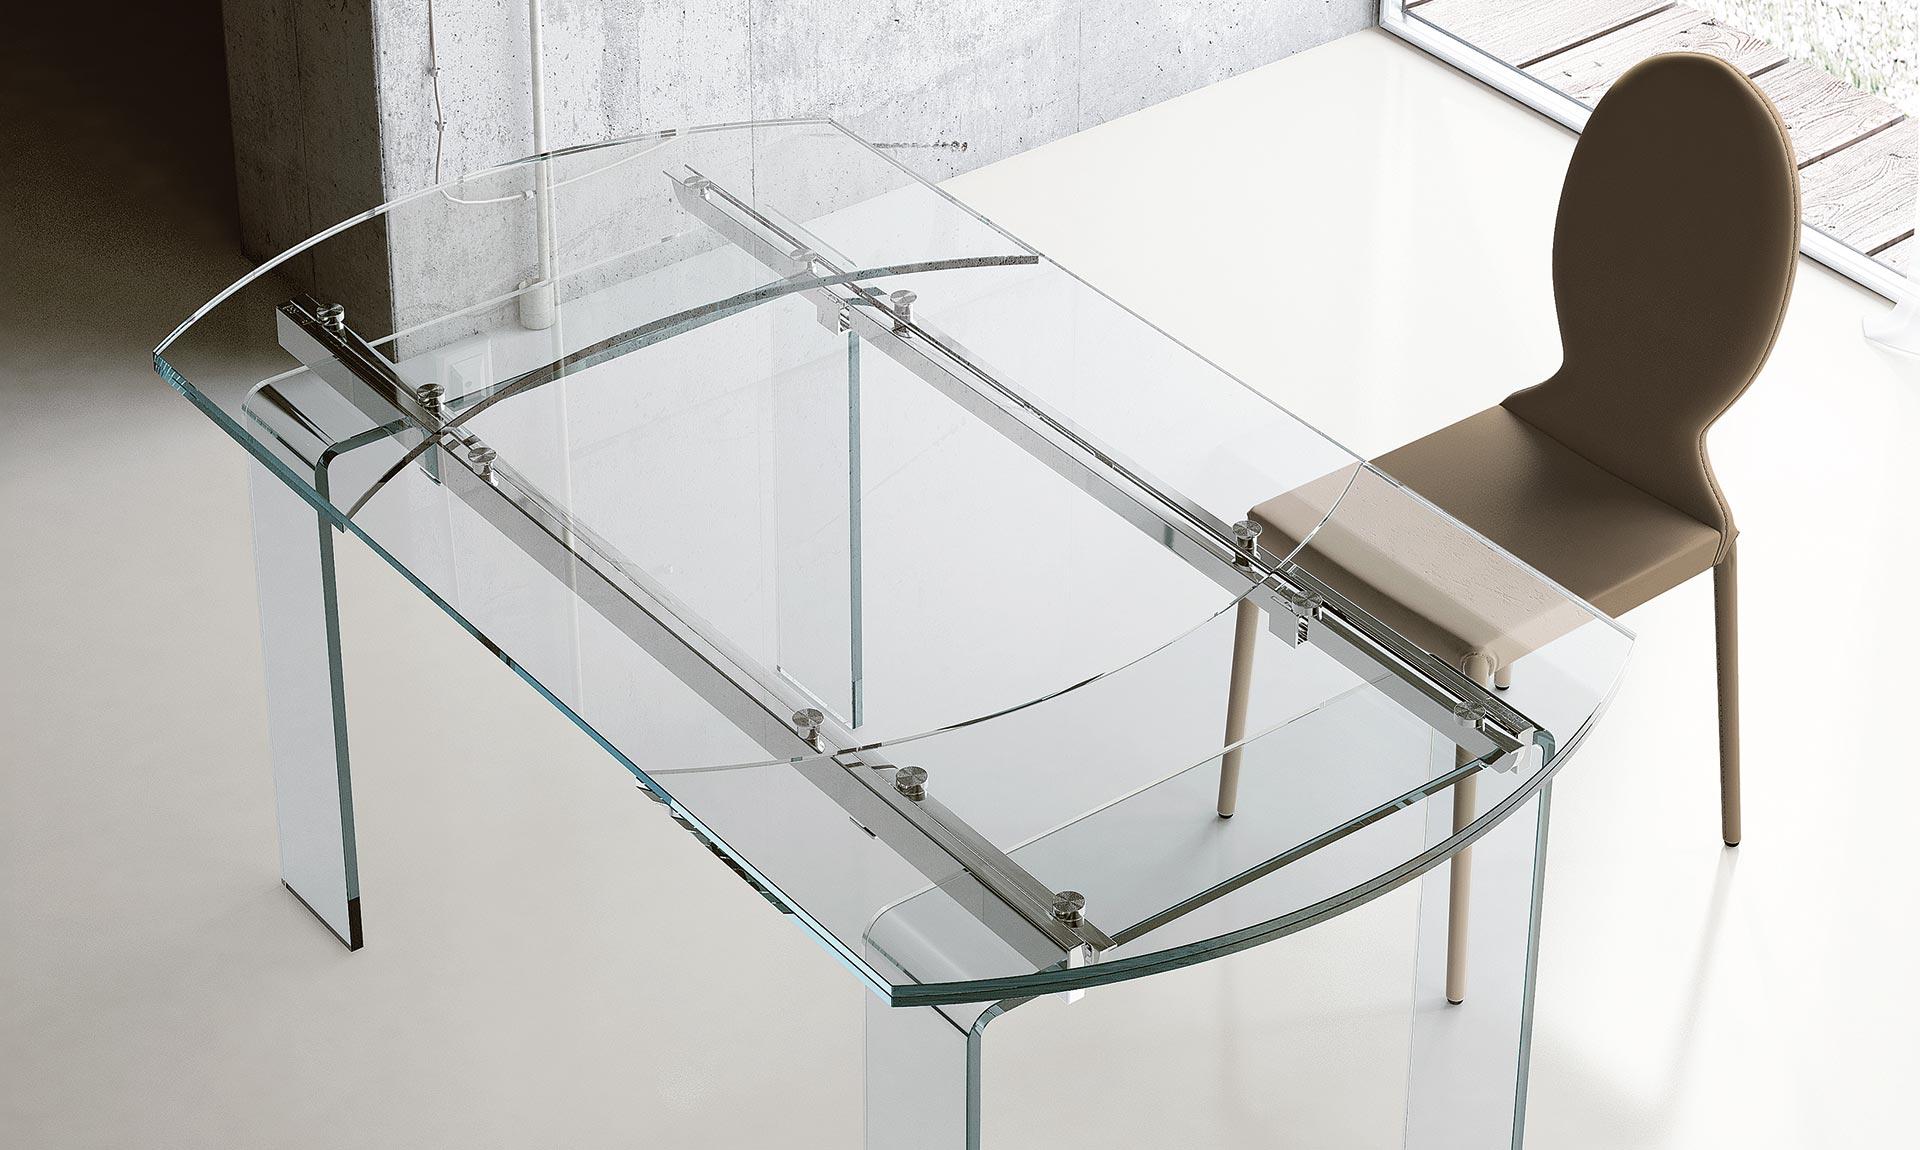 Tavolo ovale allungabile in vetro lord meroni arreda for Tavolo ovale allungabile vetro